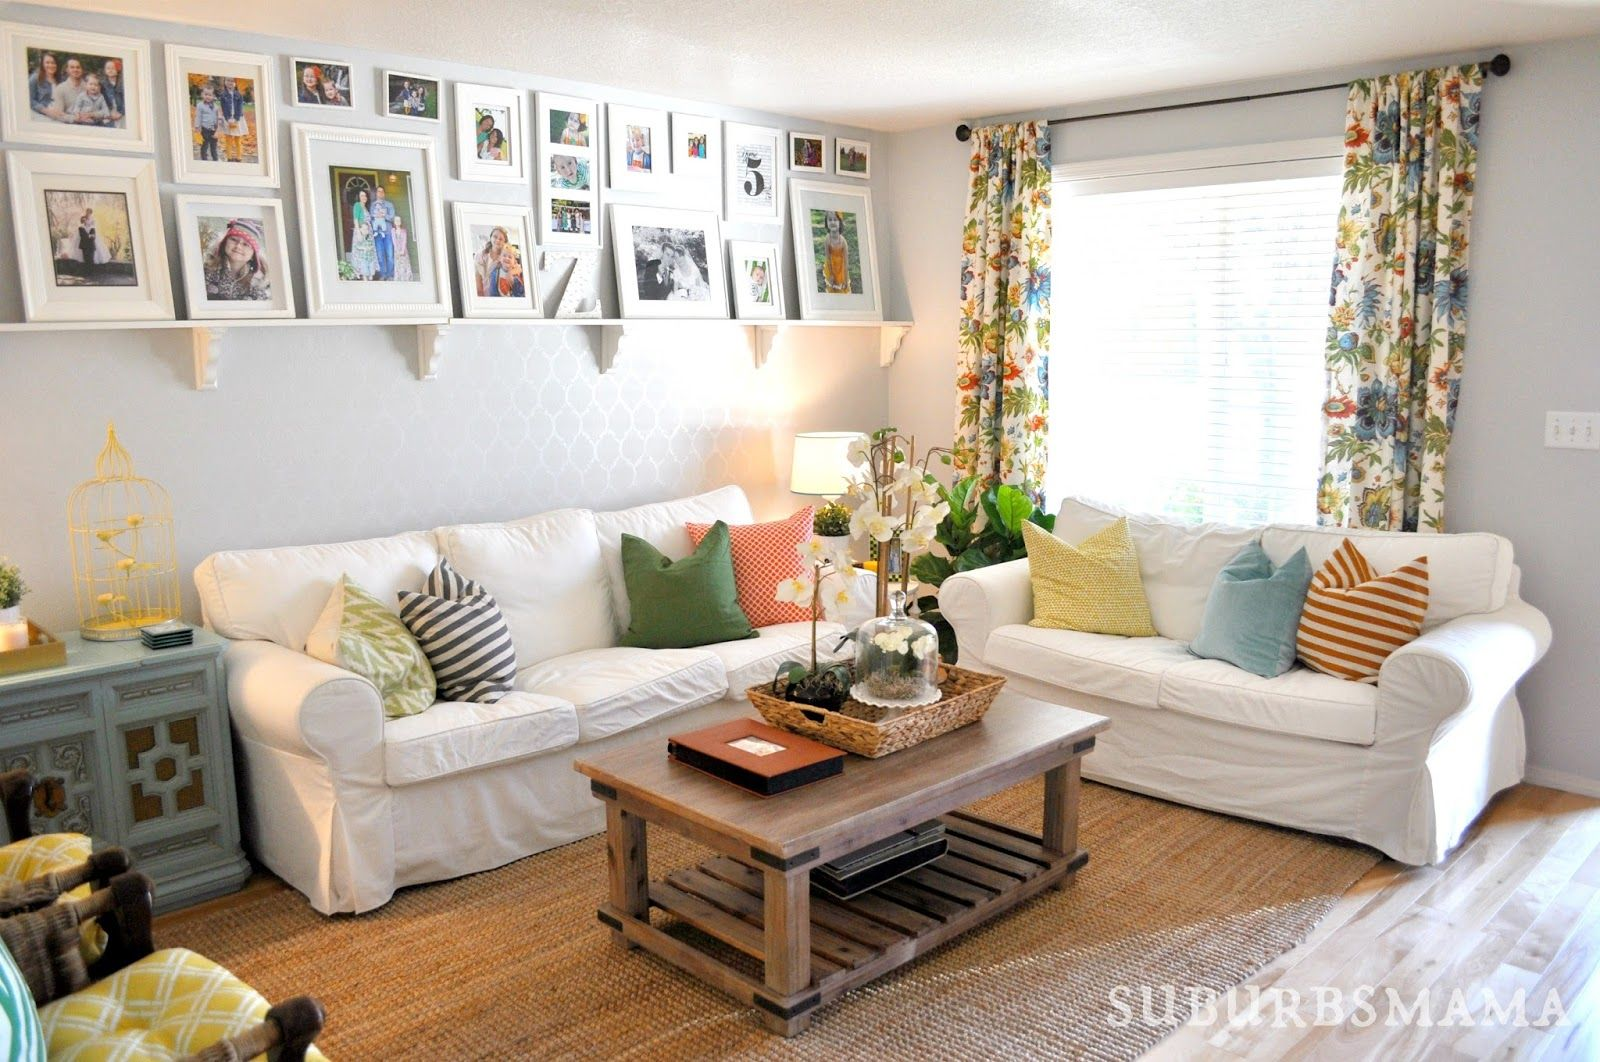 Living room with white ikea ektorp sofas living room - Ikea furniture for small living room ...